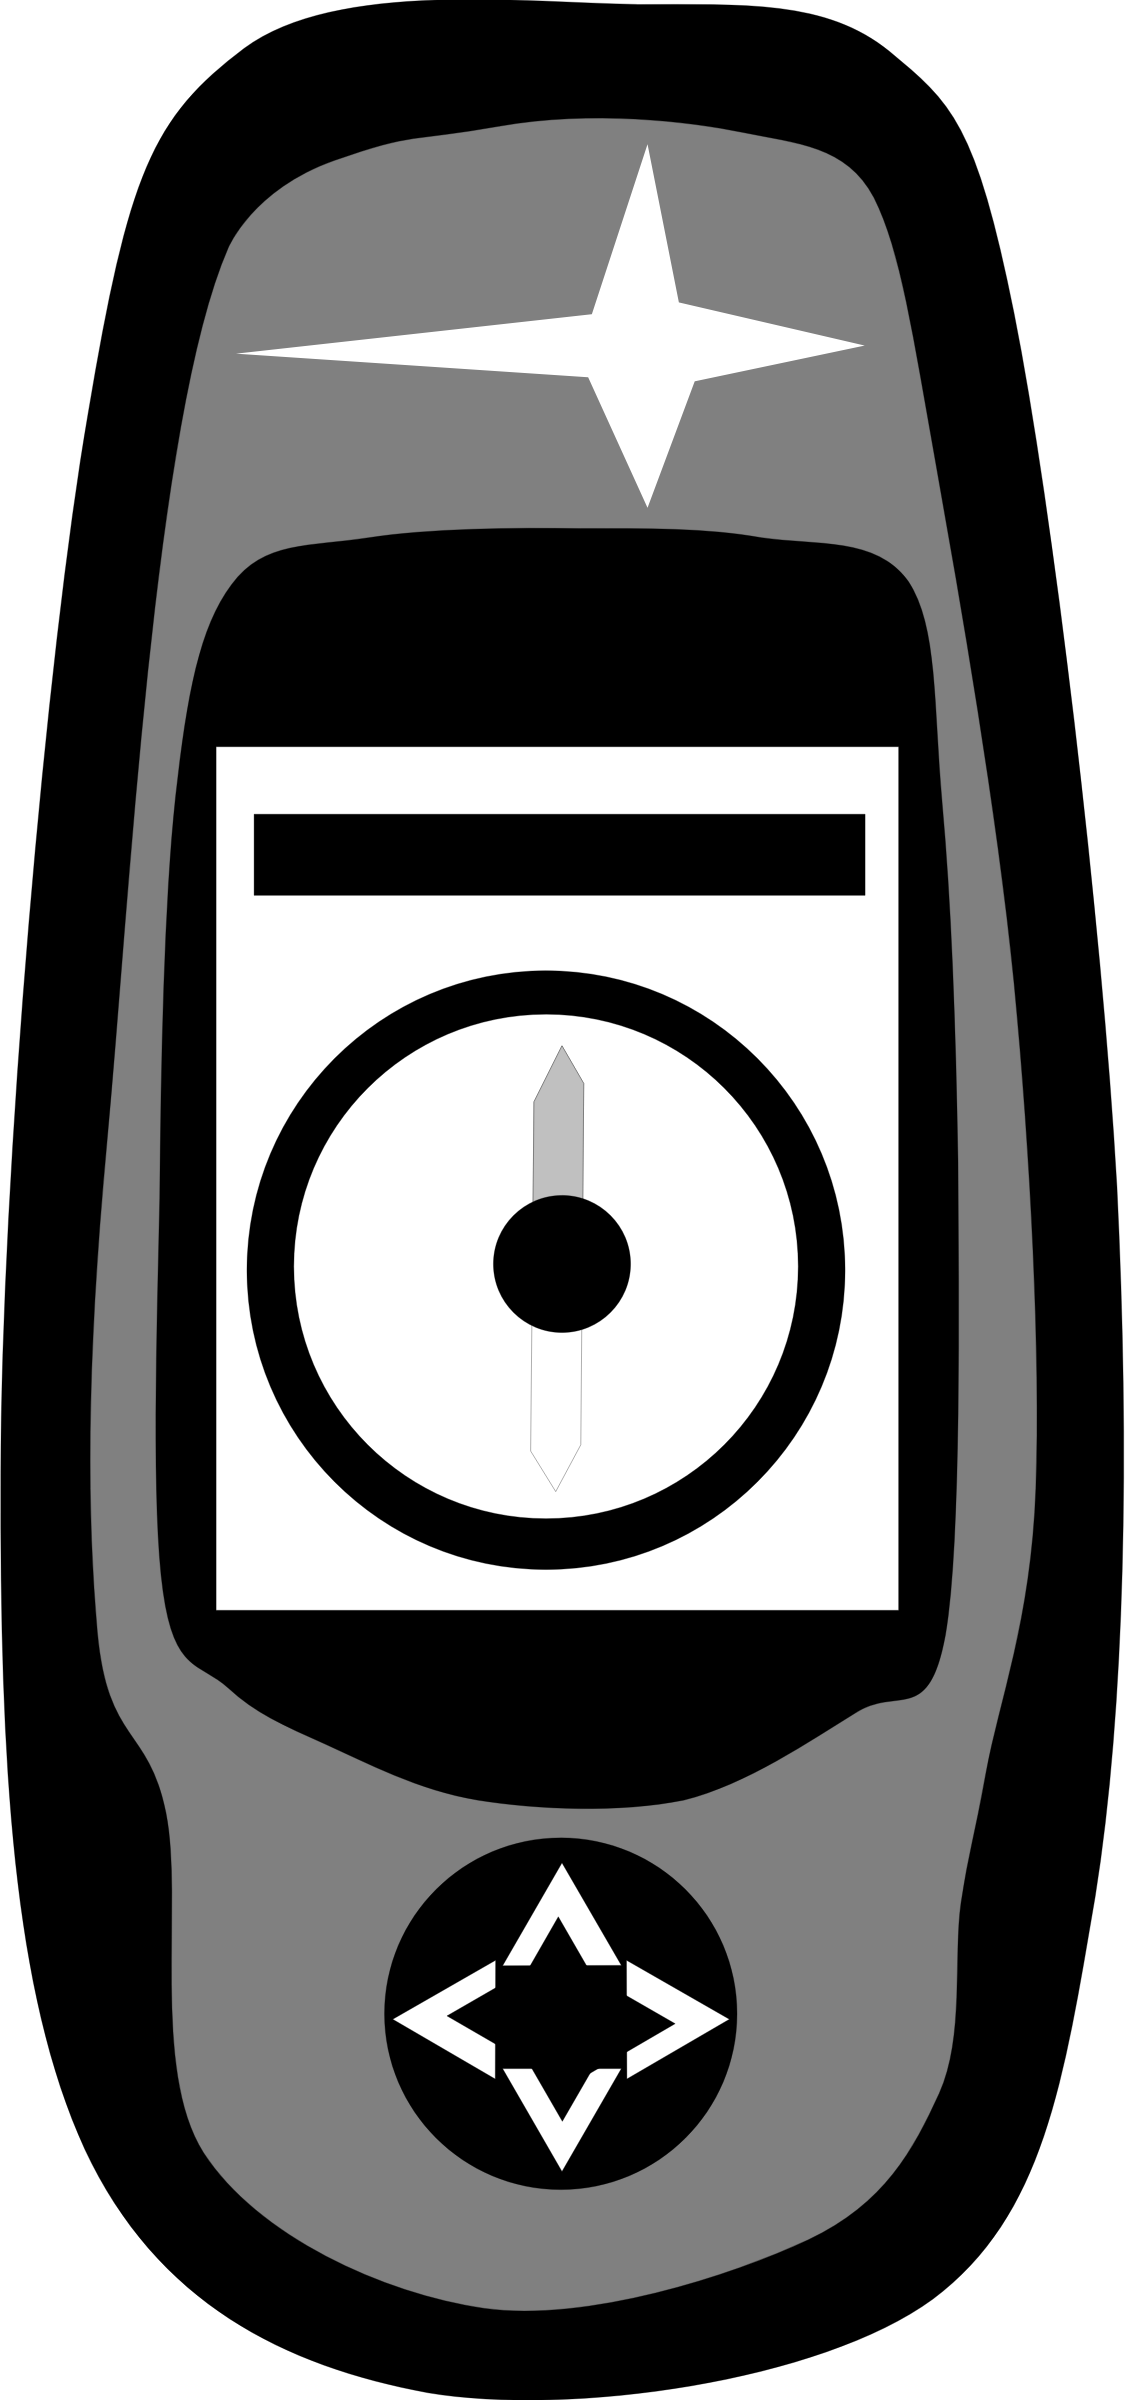 vector transparent stock Gps clipart. Magelan handheld big image